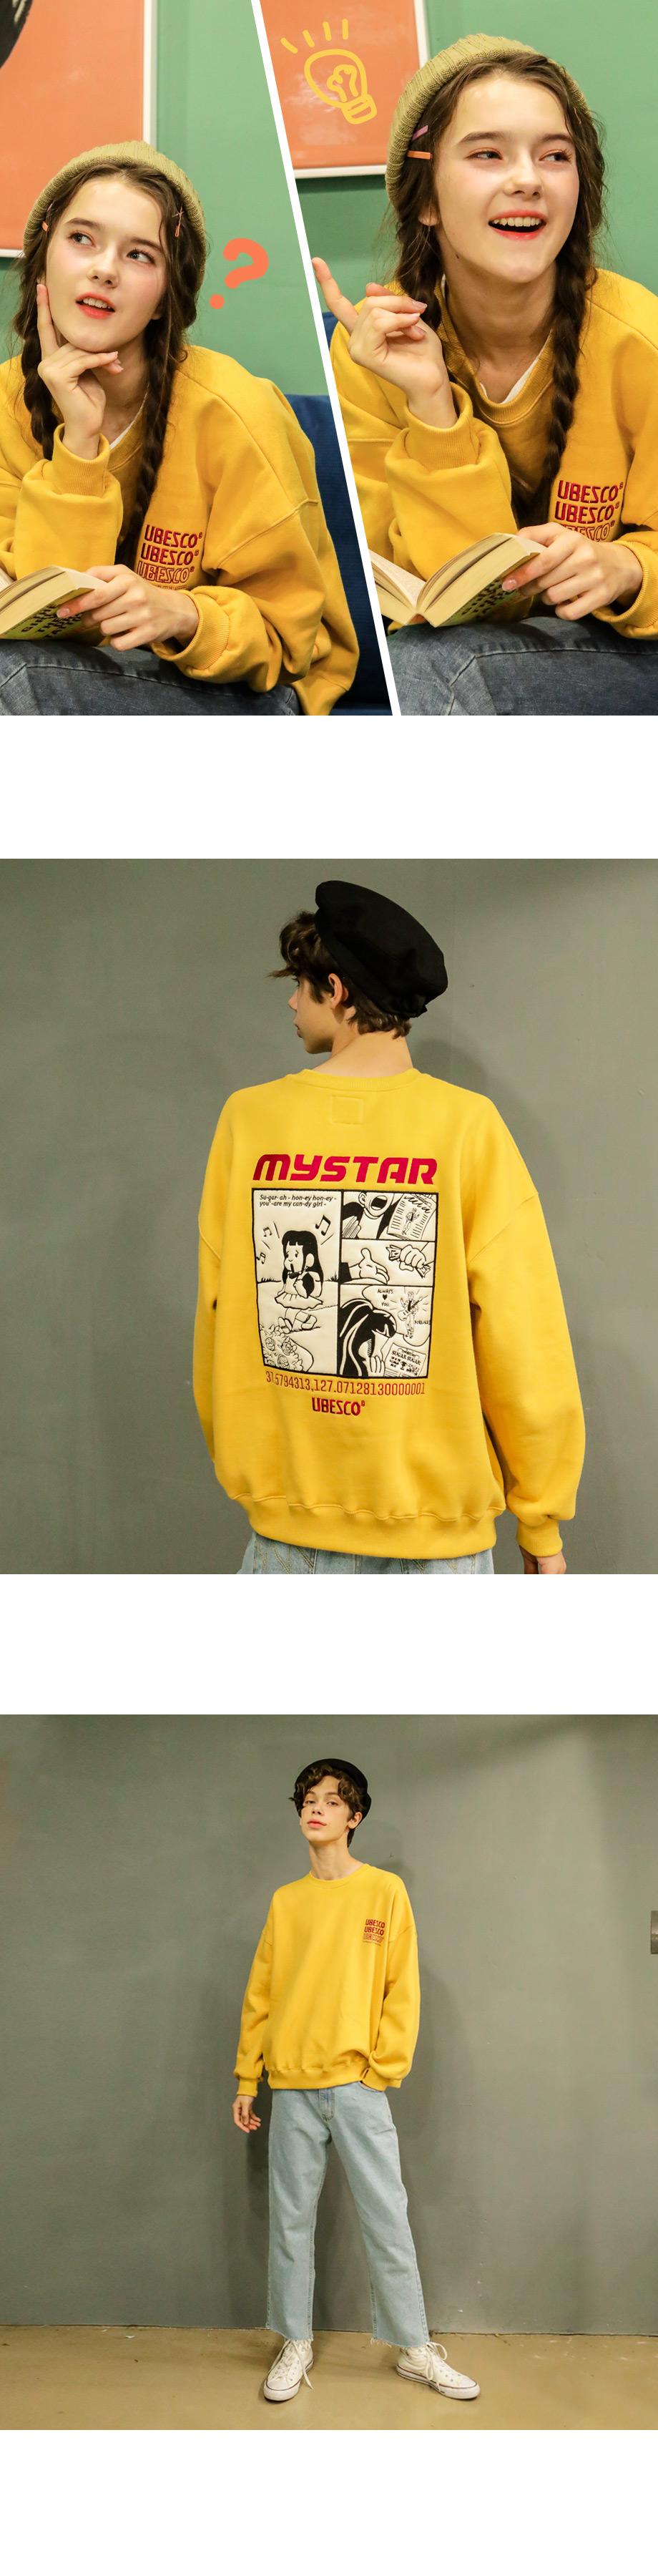 20180911_uc_mystar_model_ms_01.jpg